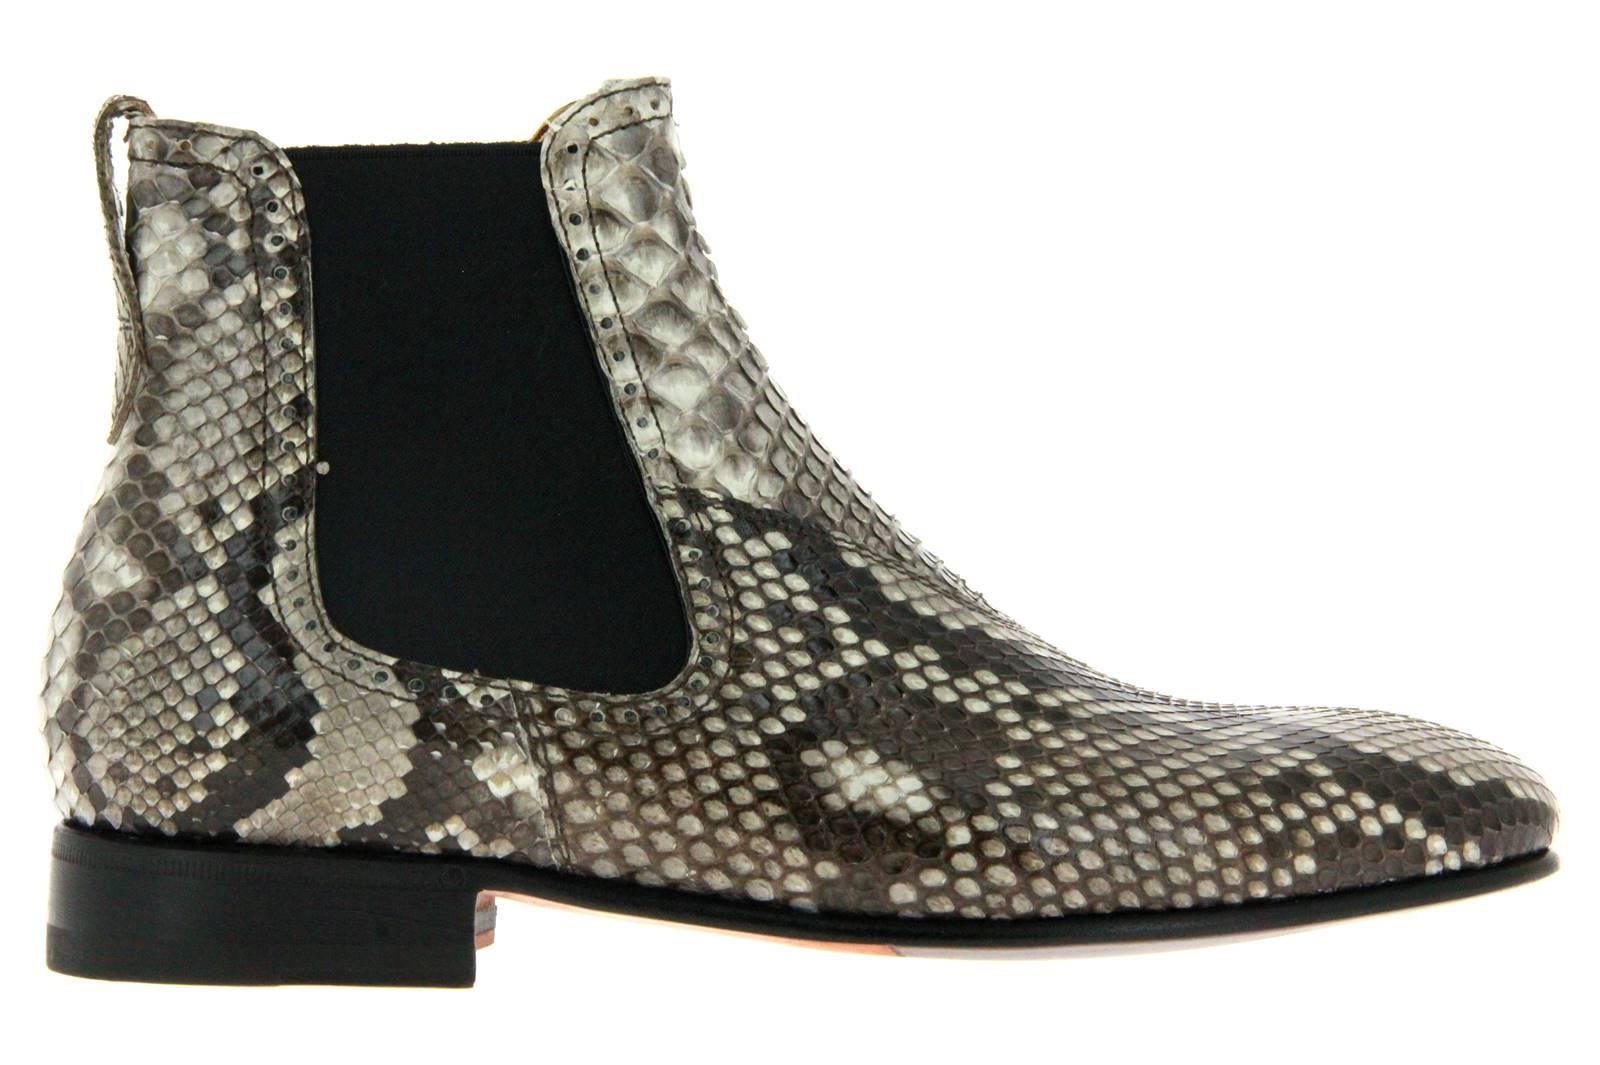 Benson's Chelsea Boot ACAPULCO ROCCIA (38)